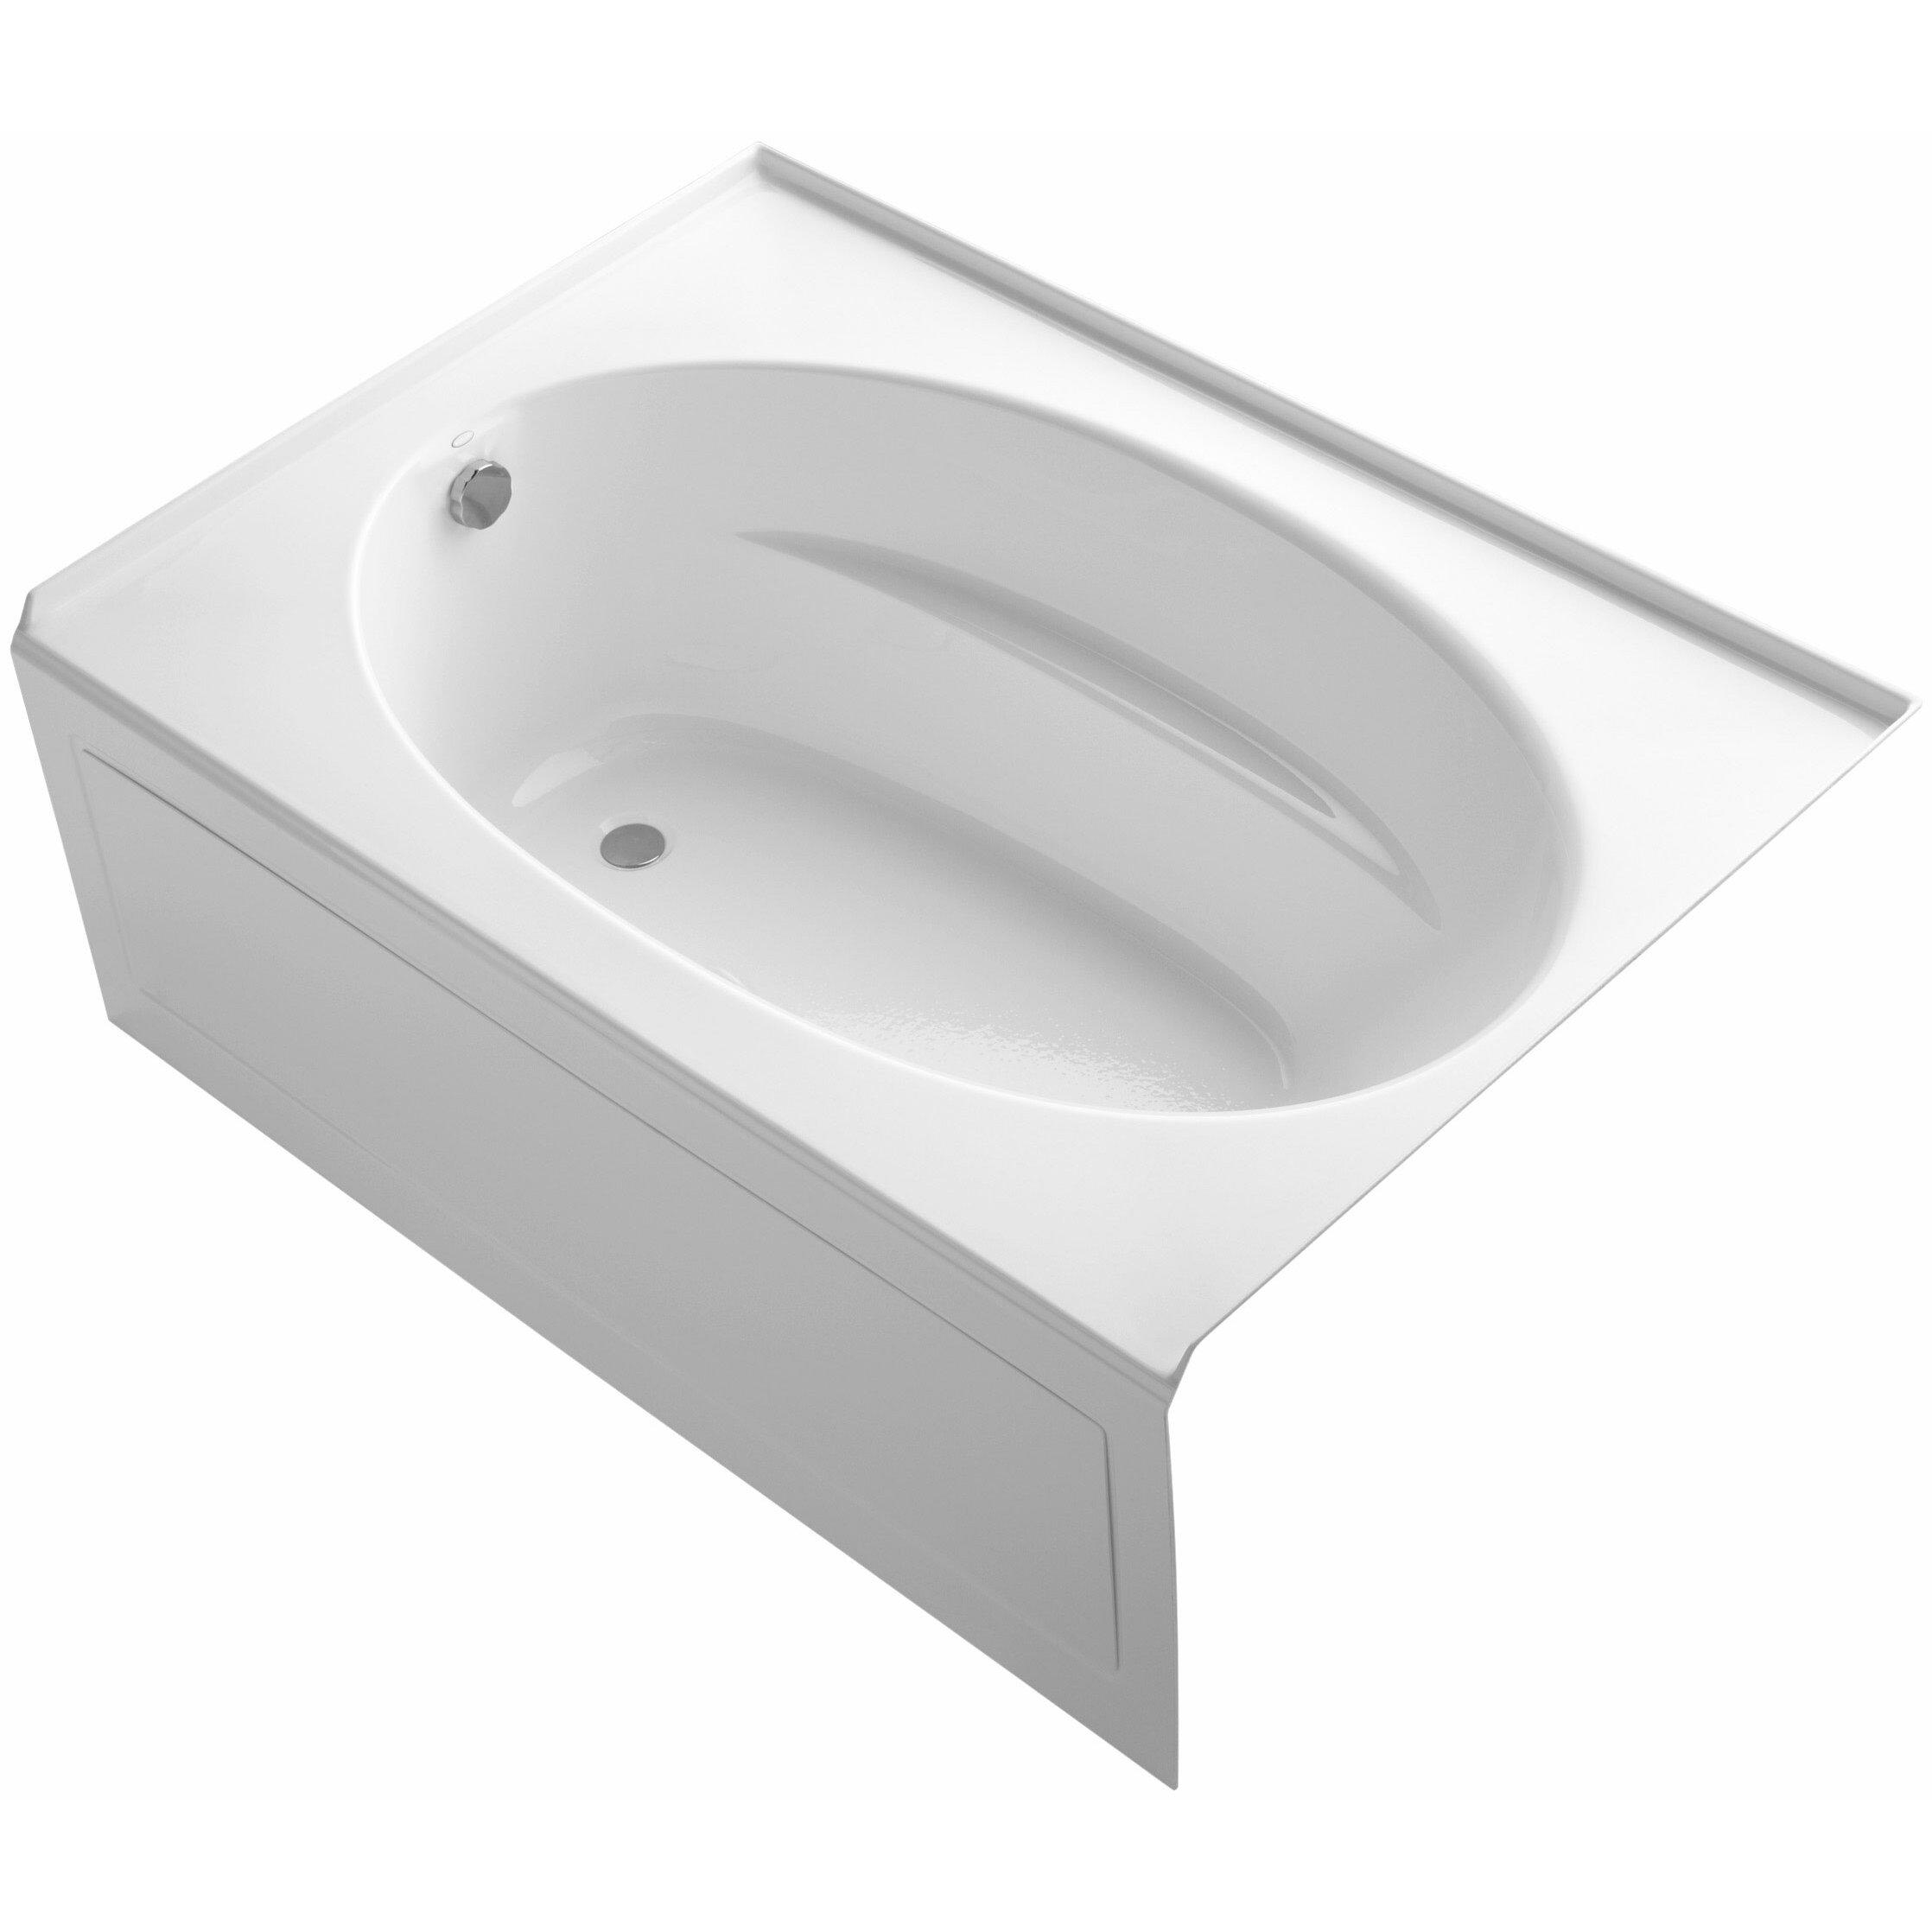 Bathtubs 60 X 42 28 Images Reliance Reliance 60 X 42 Whirlpool Bathtub Walmart Maax 102863